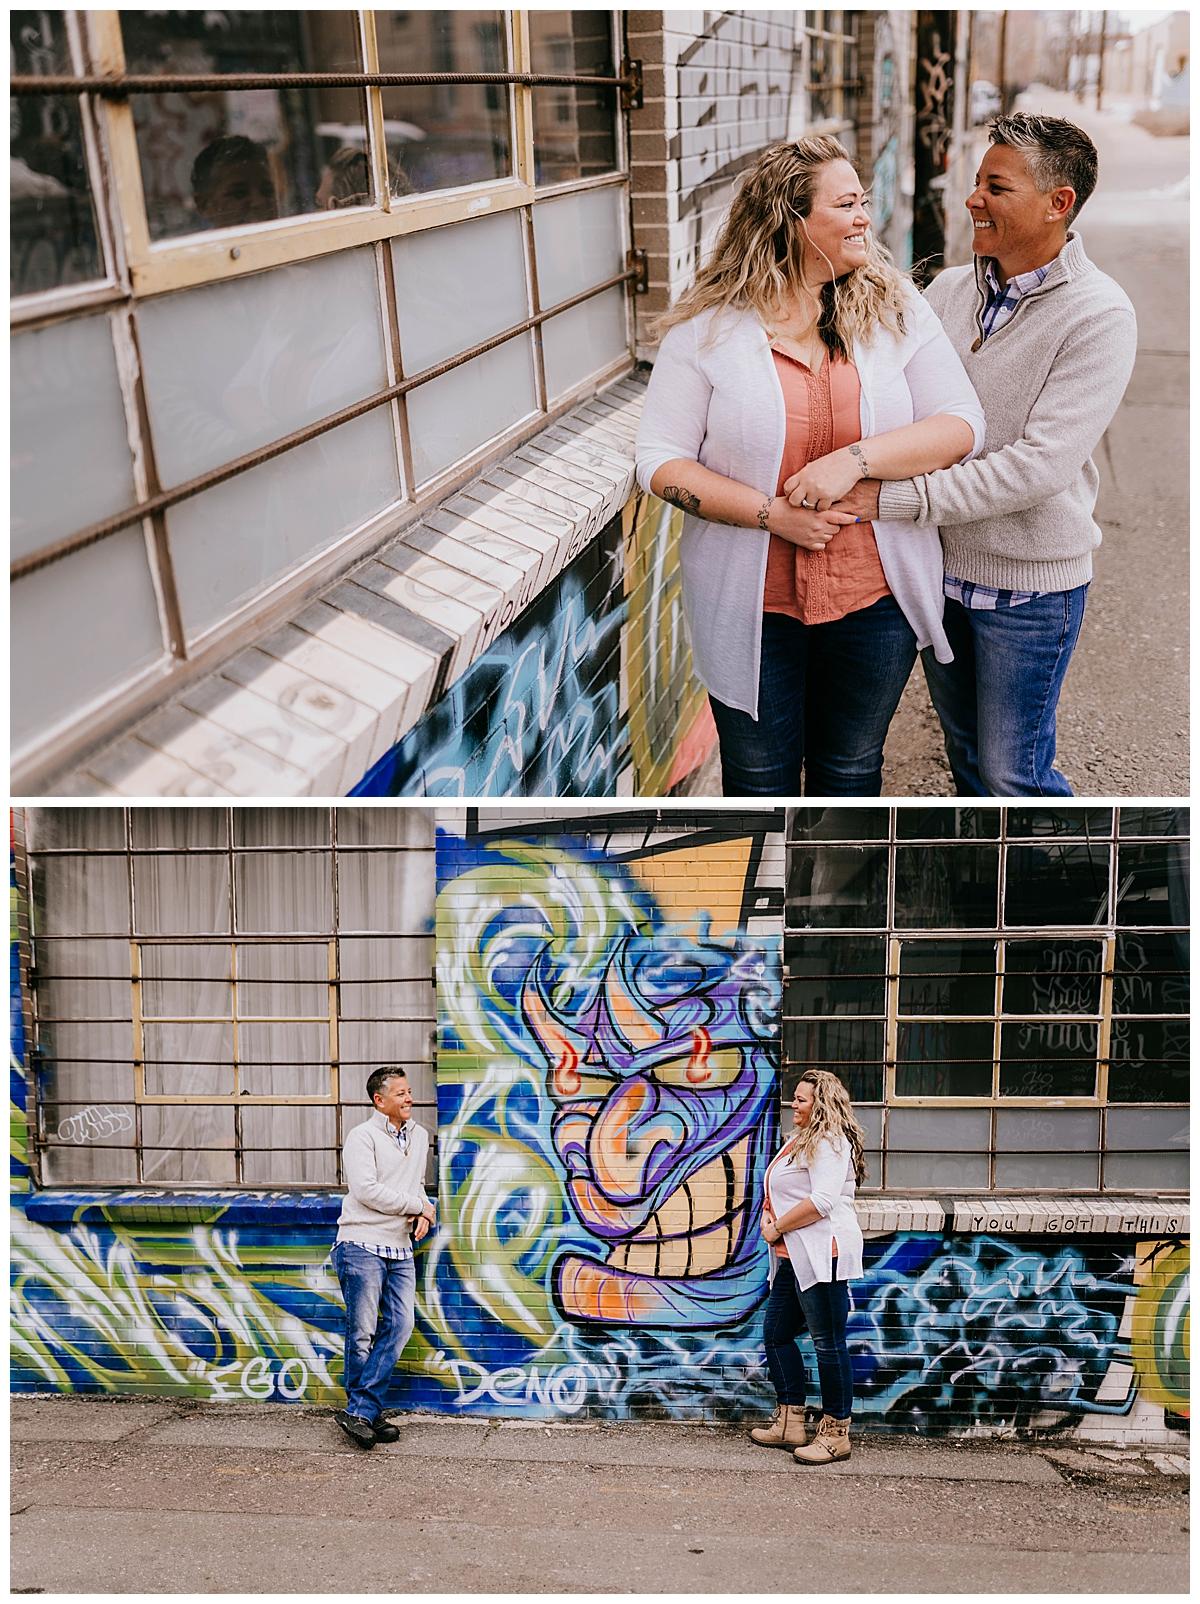 Hannah & Shanna Engagement Session RiNo District Denver CO 39